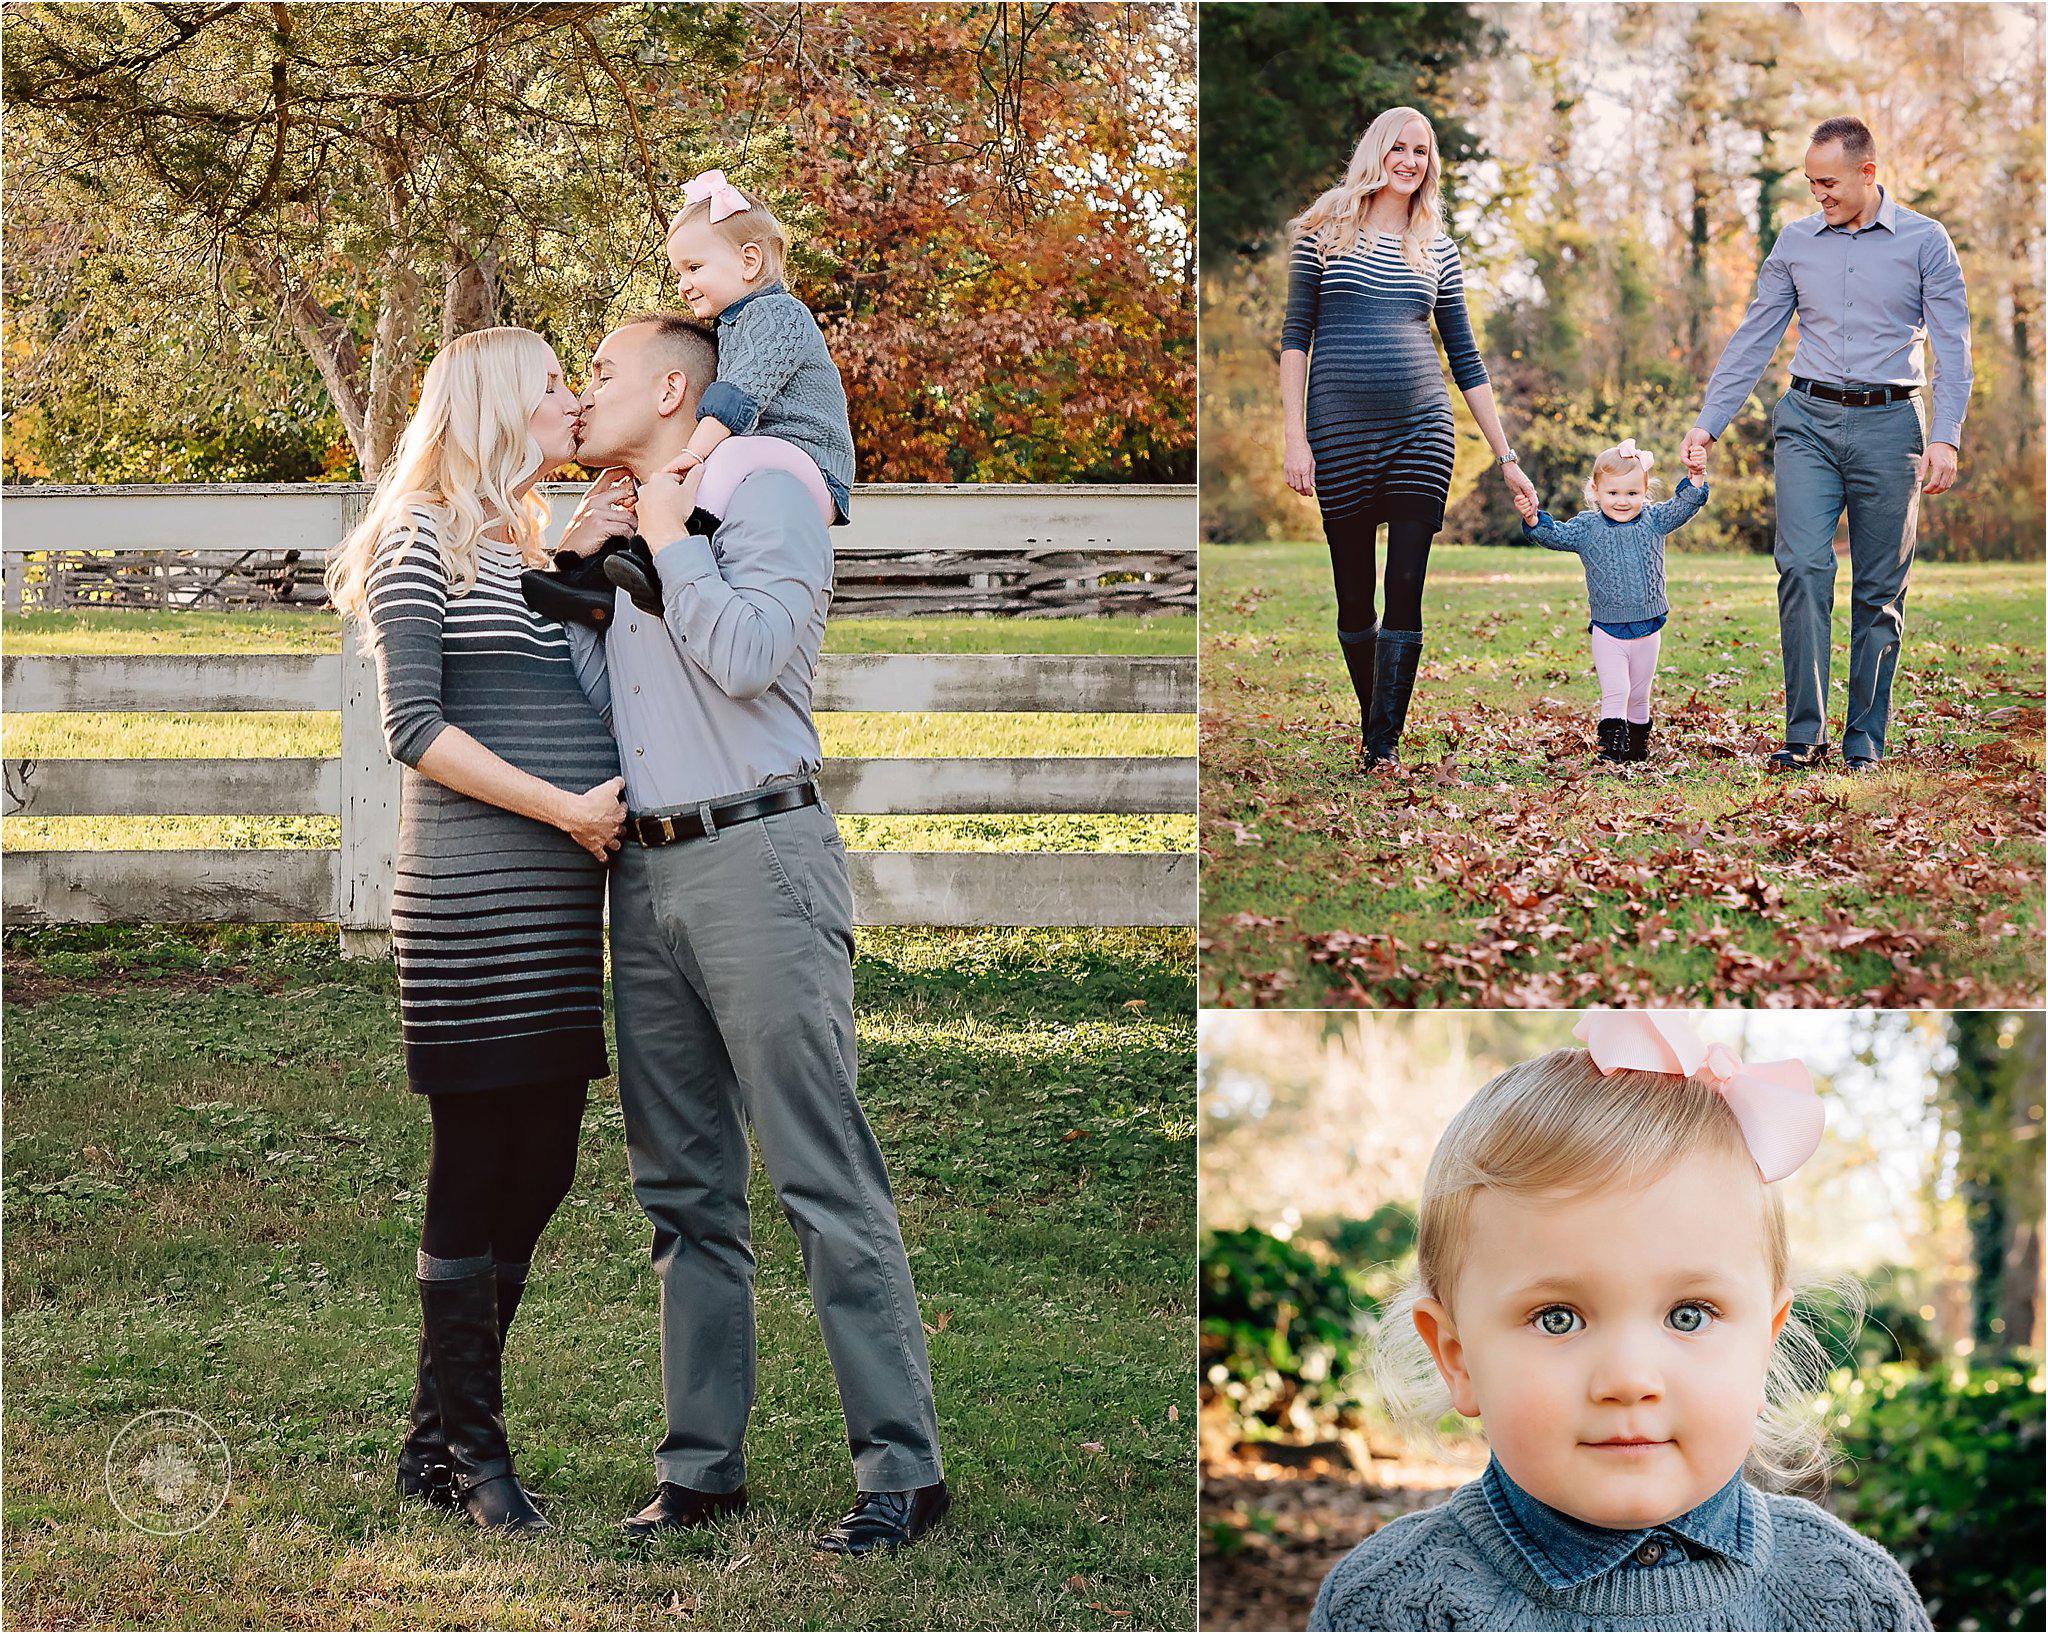 williamsburg-maternity-session-melissa-bliss-photography-family-photographers-norfolk-virginia-beach-chesapeake